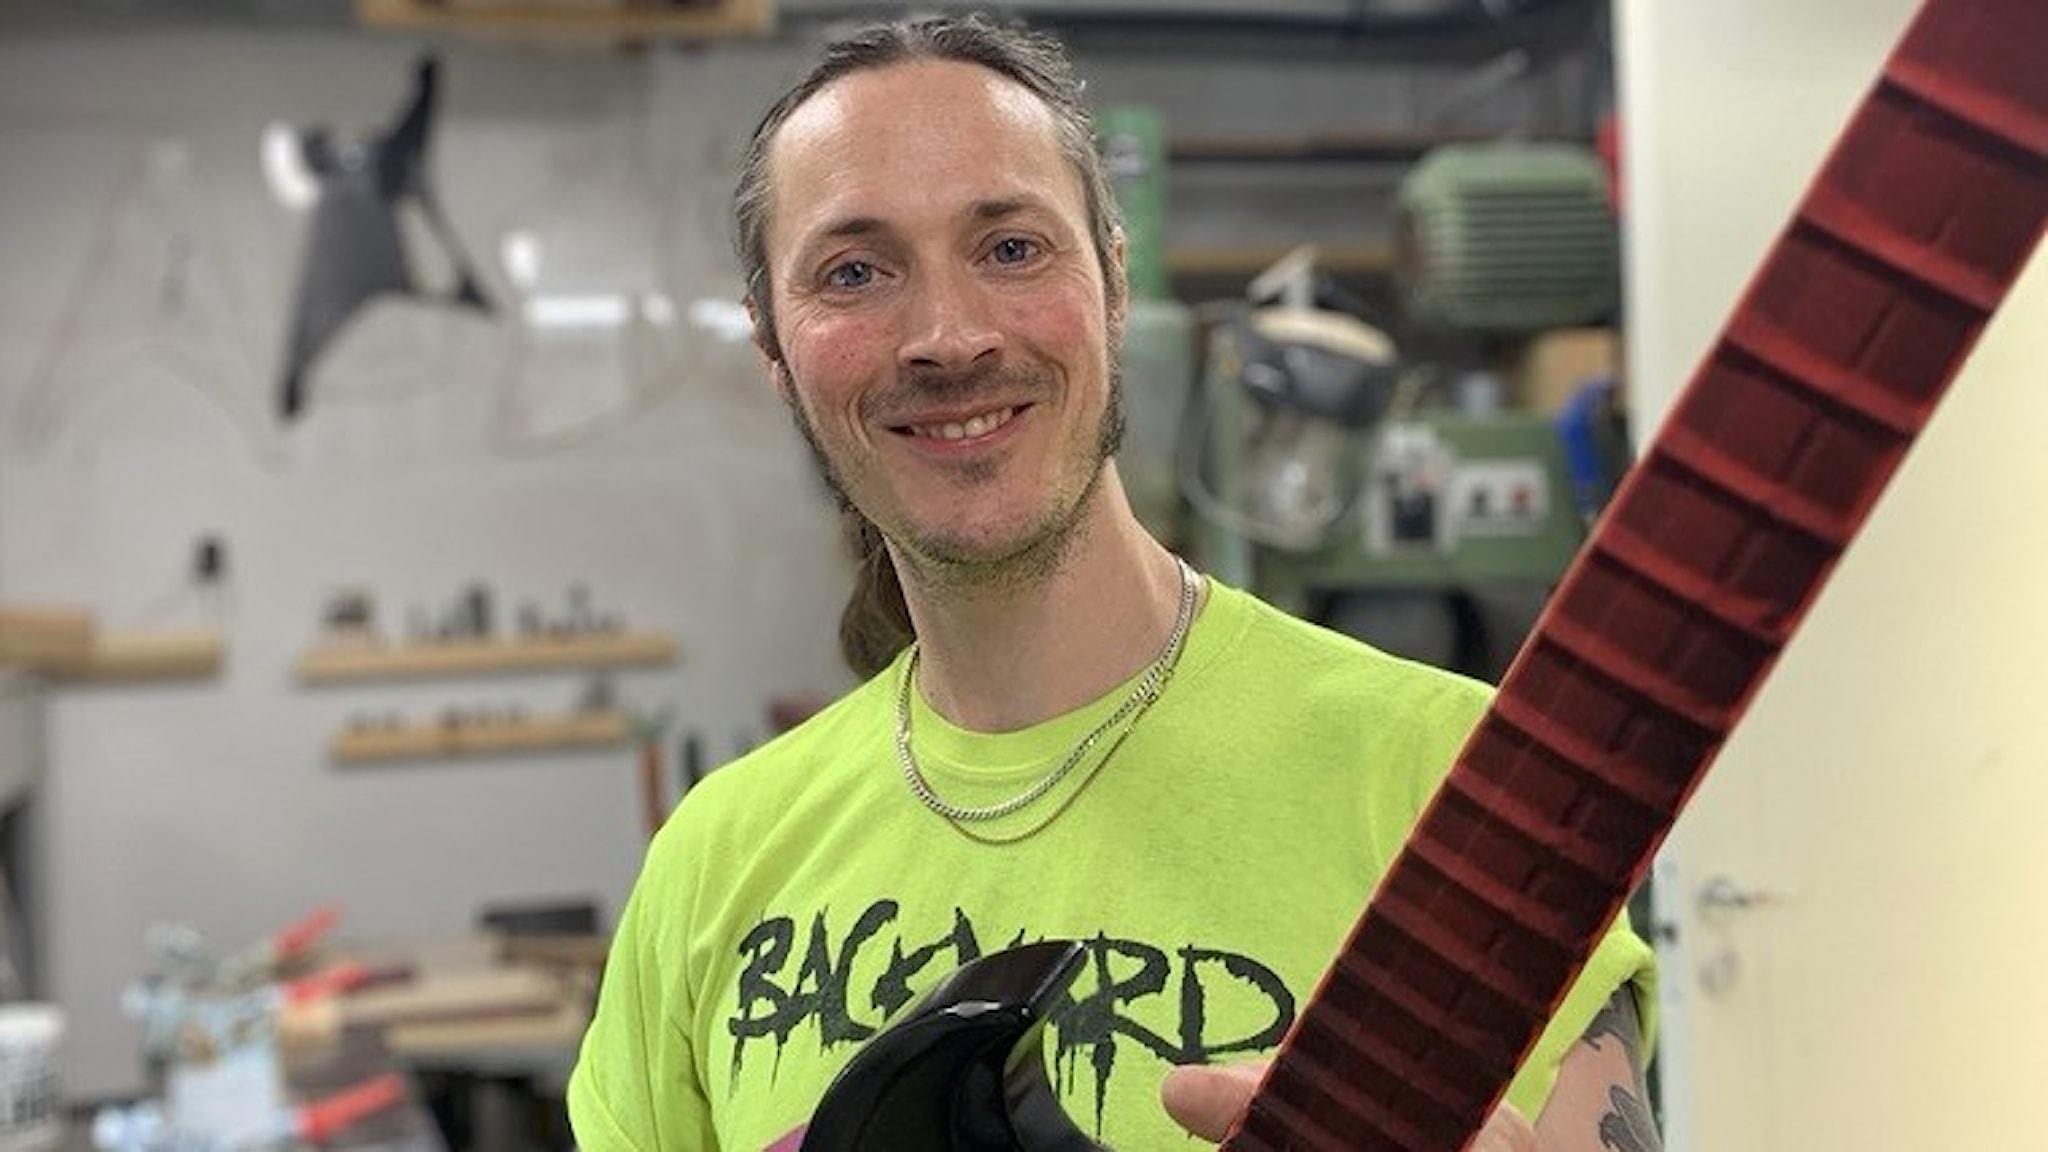 en man med en gitarr